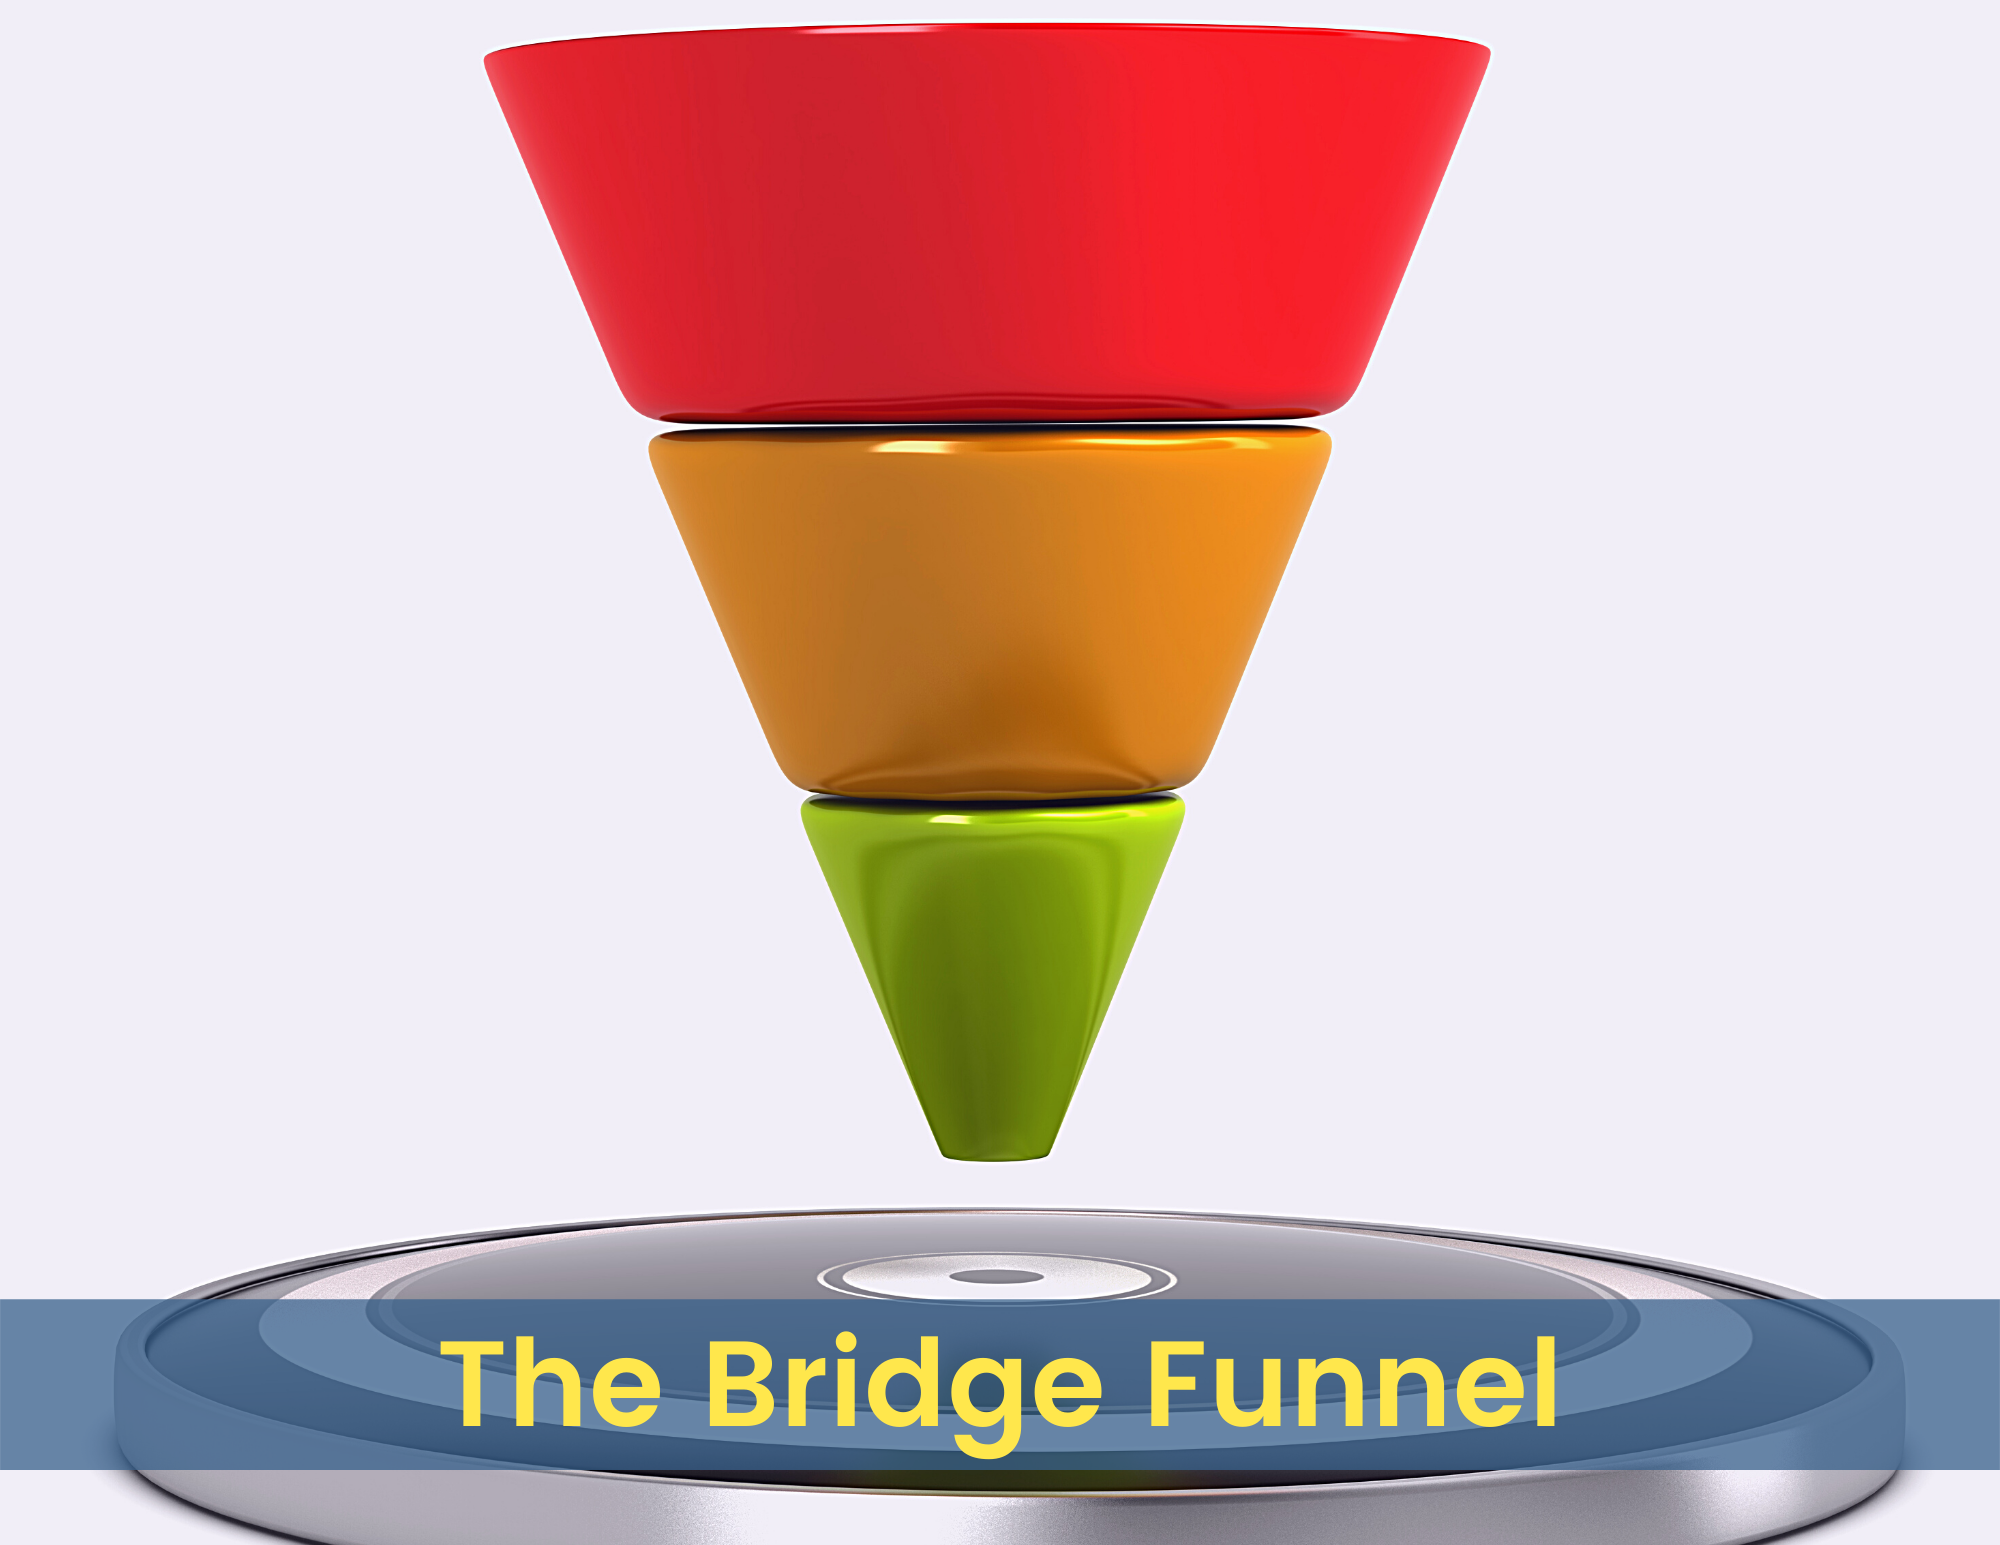 The Bridge Funnel